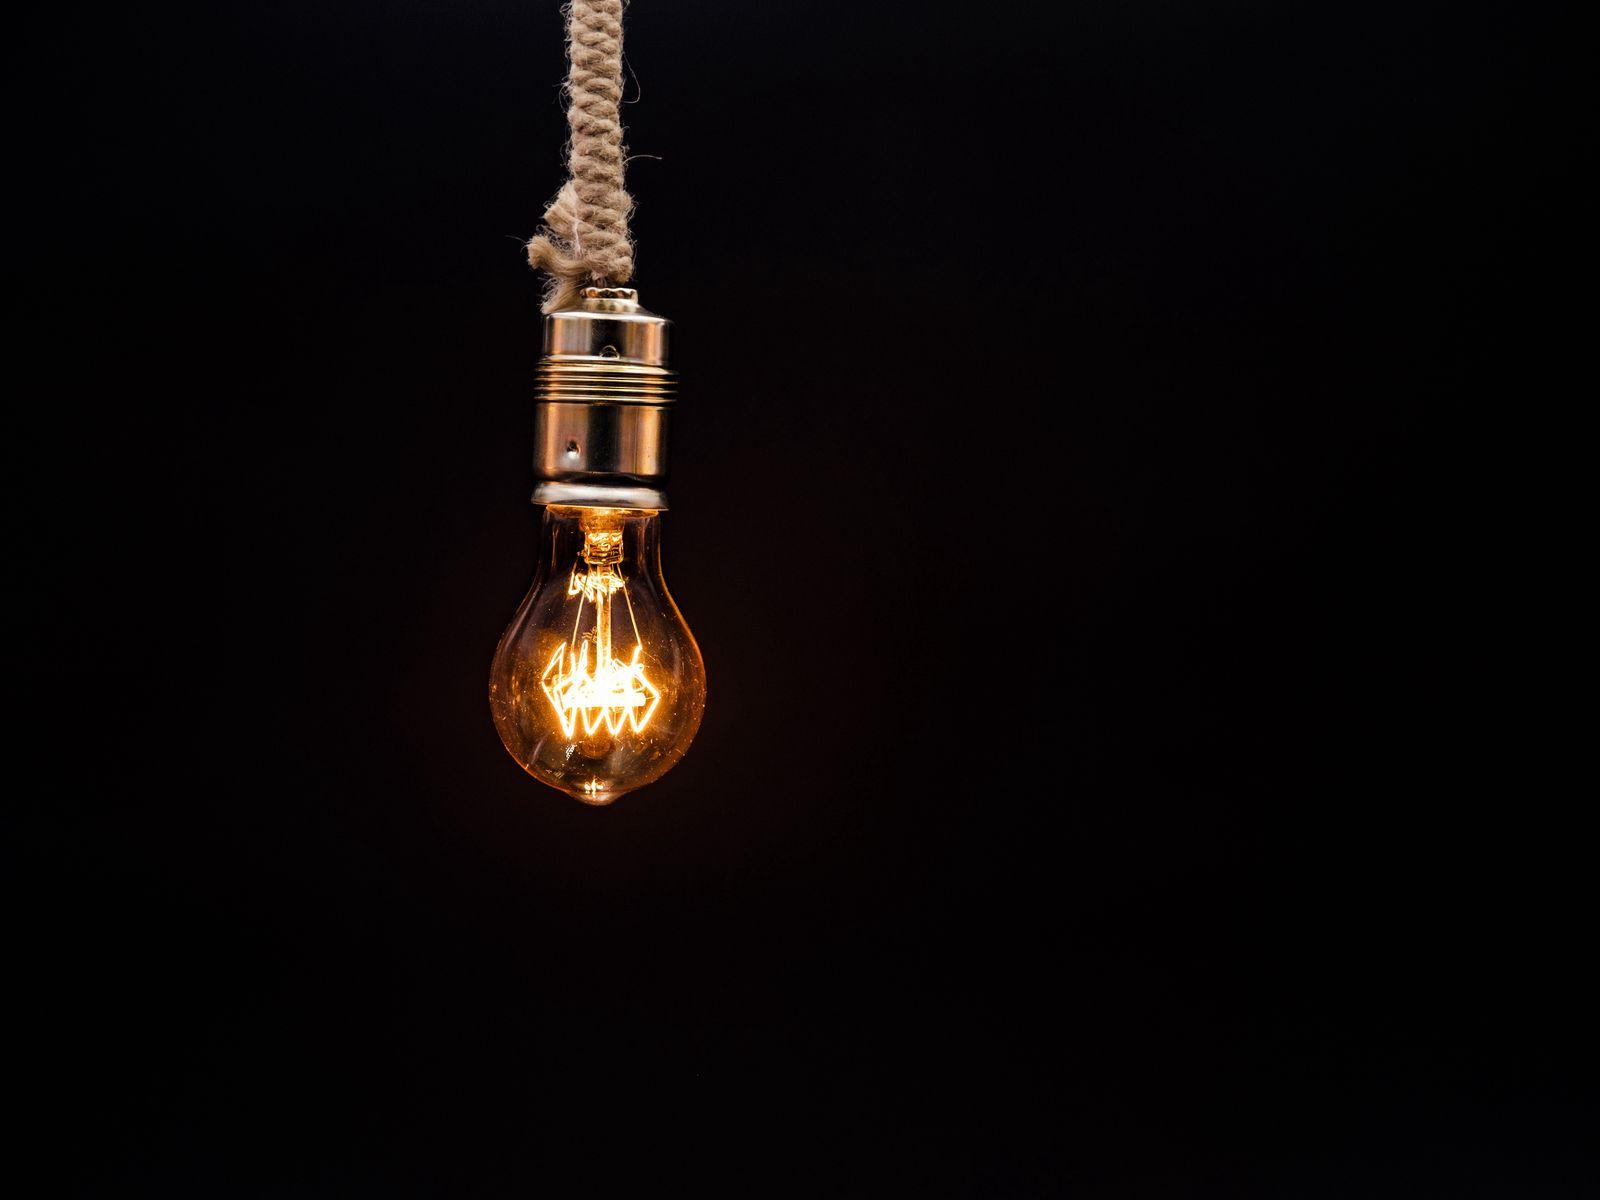 1600x1200 Wallpaper bulb, lighting, rope, electricity, edisons lamp